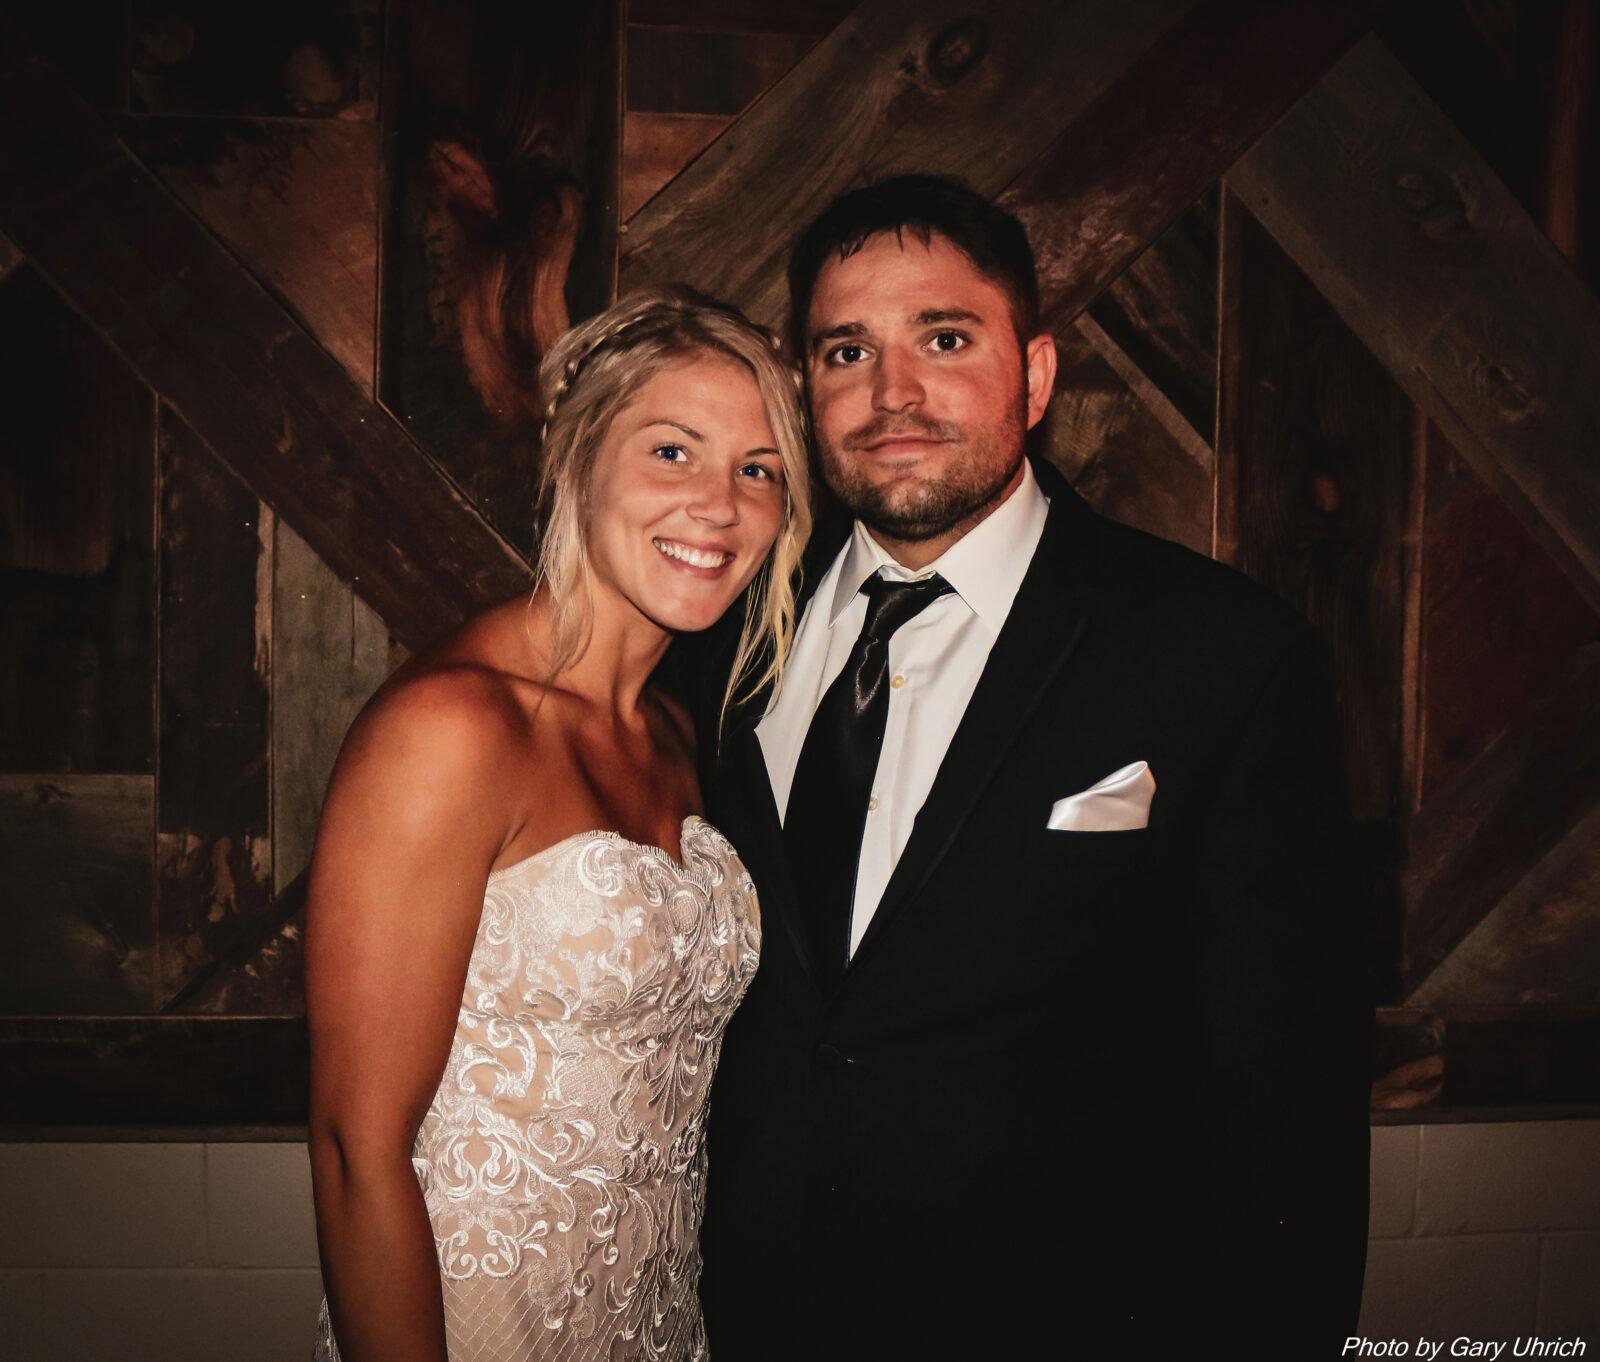 August 2020 Wedding Reception Wedding Dress Brides Dress Groom Tuxedo